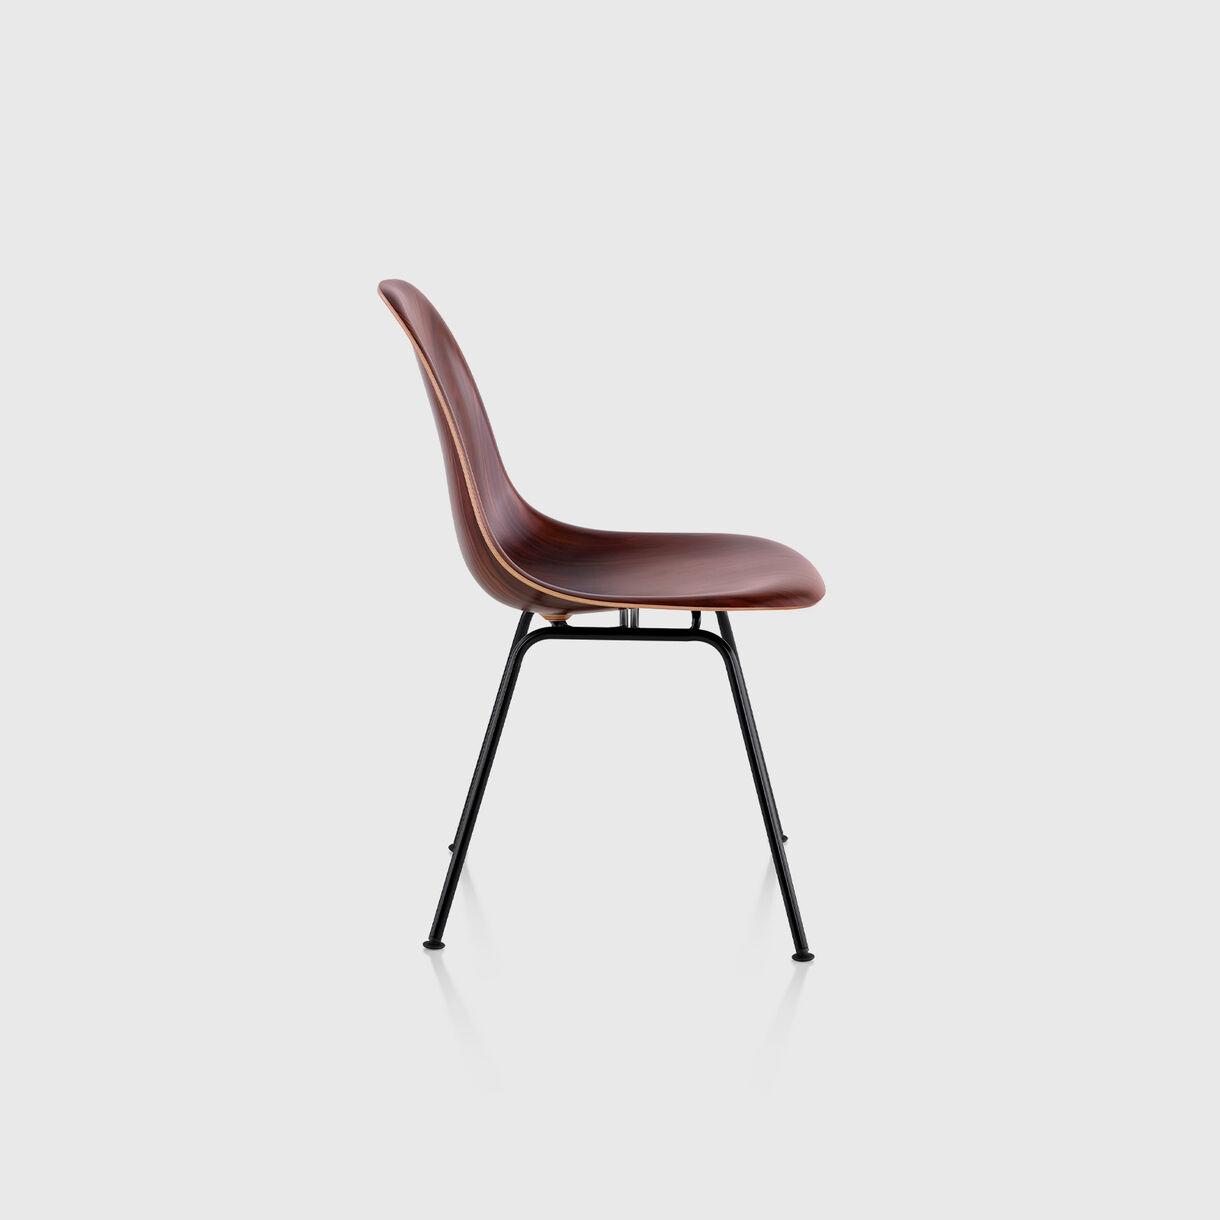 Eames Moulded Wood Side Chair, 4-Leg Base